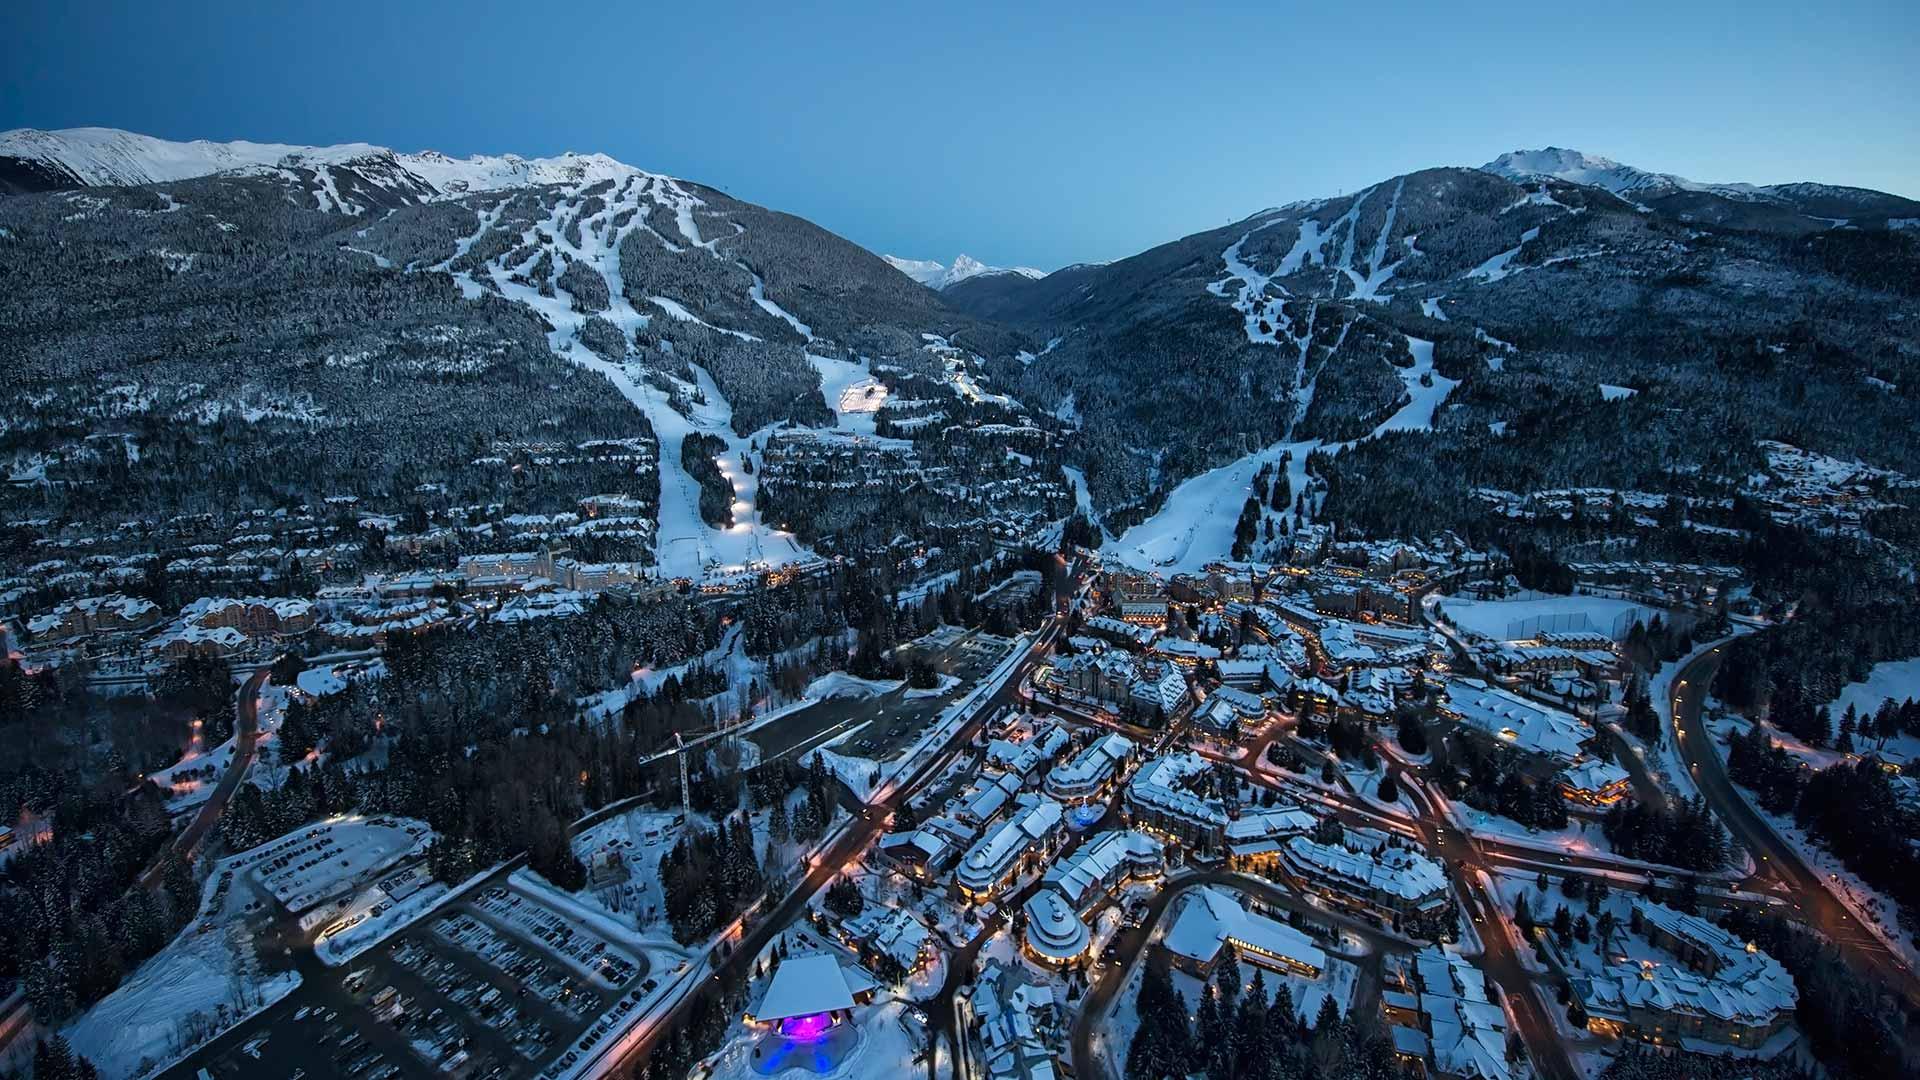 Winter-Dual-Mountain-Village-Evening-Bluebird-Lights-DavidMcColm-26390.jpg